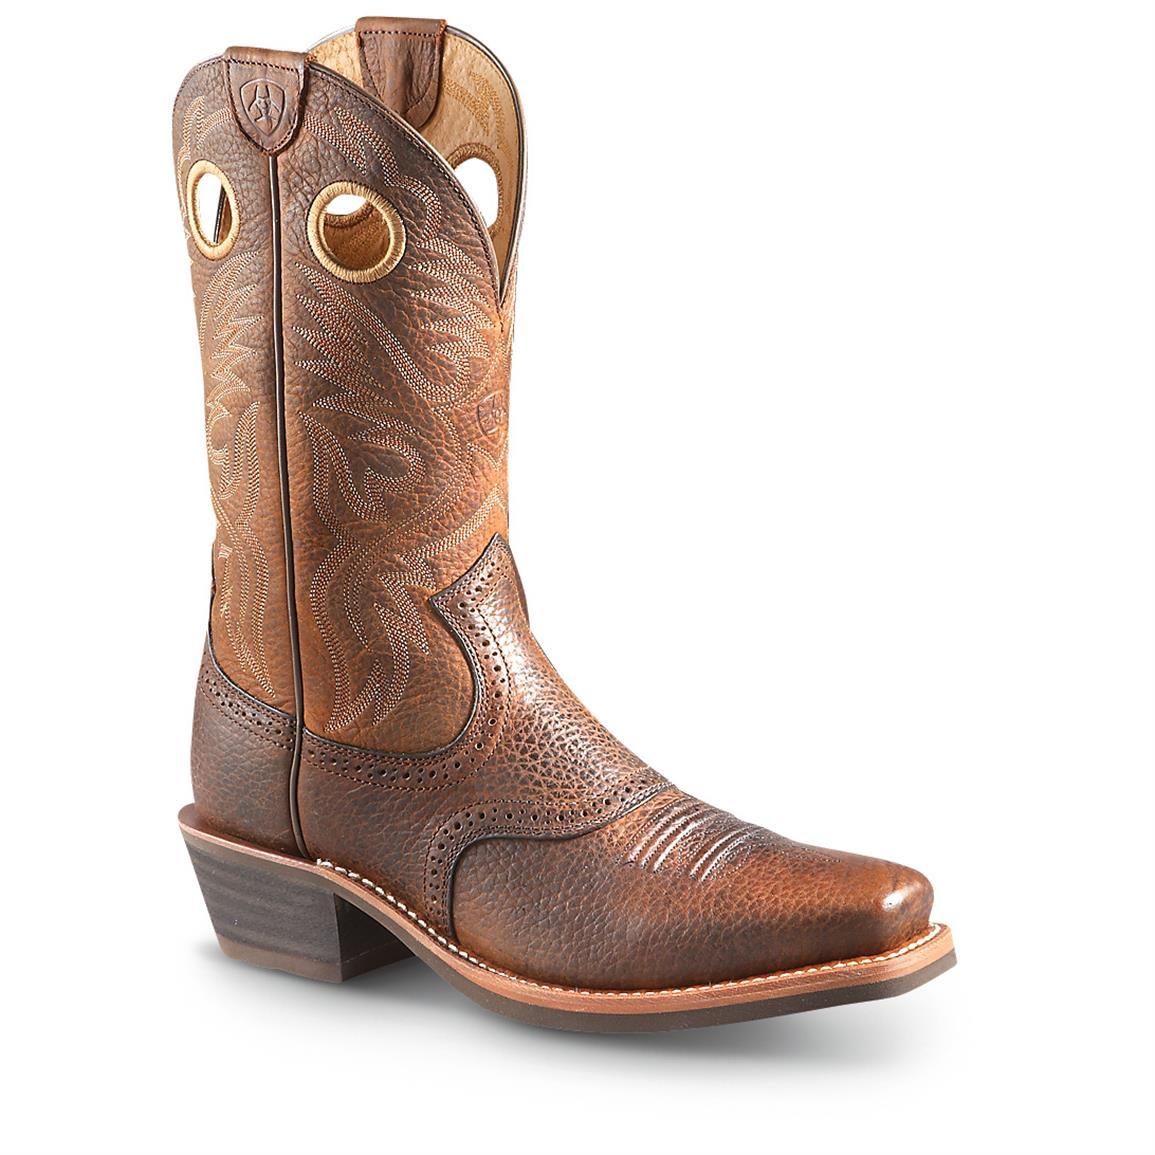 ariat cowboy boots ariat menu0027s roughstock cowboy boots, brown oiled rowdy ... rtxklqw